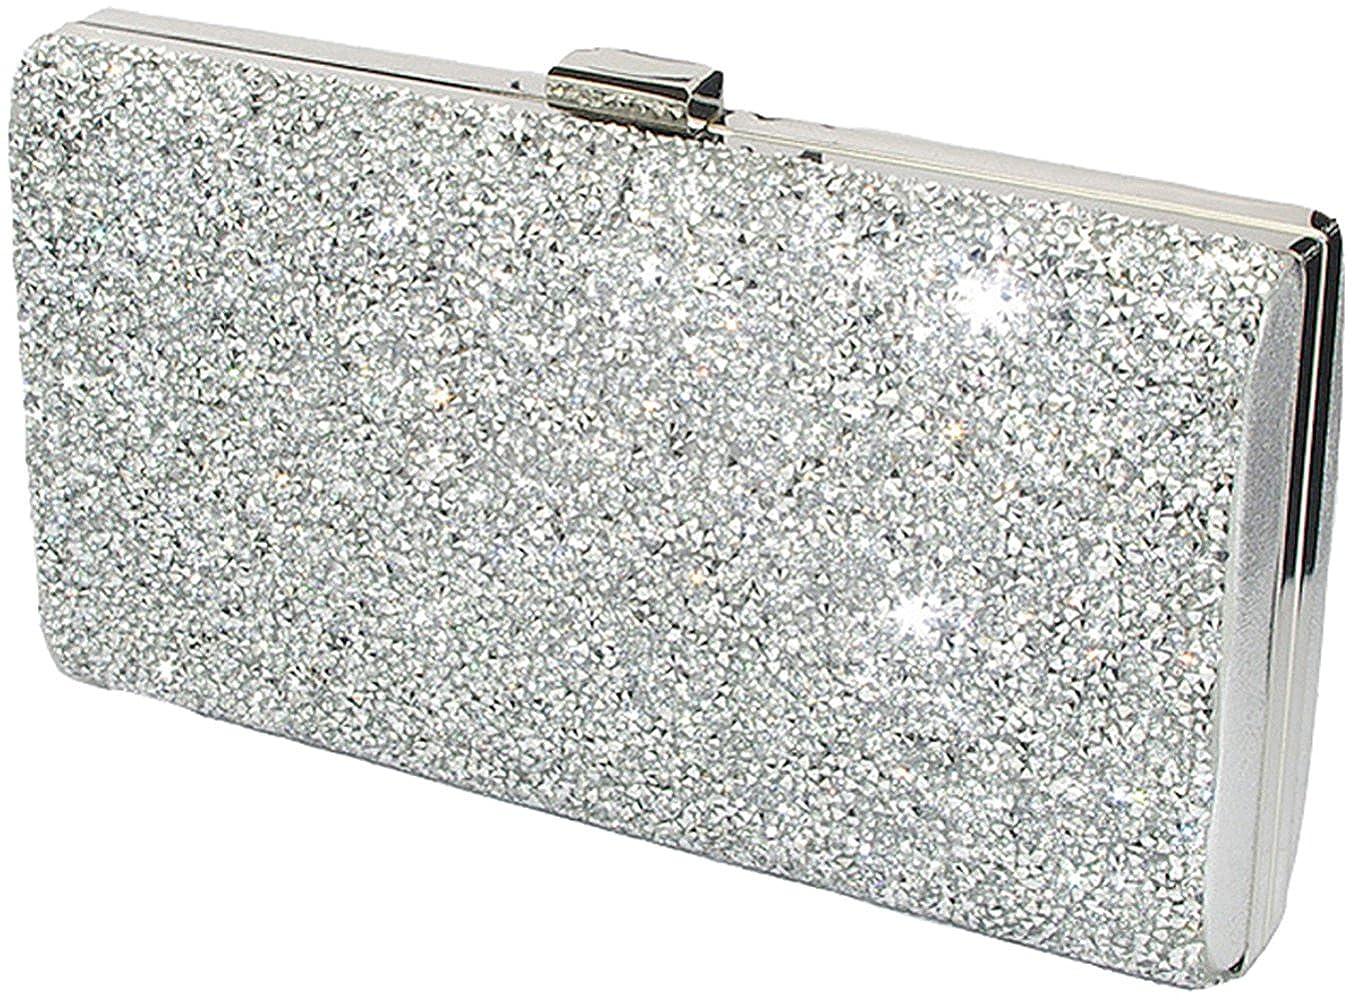 5565588f05 Covelin Women's Handbag Envelope Rhinestone Evening Clutch Bag Hot Silver:  Handbags: Amazon.com